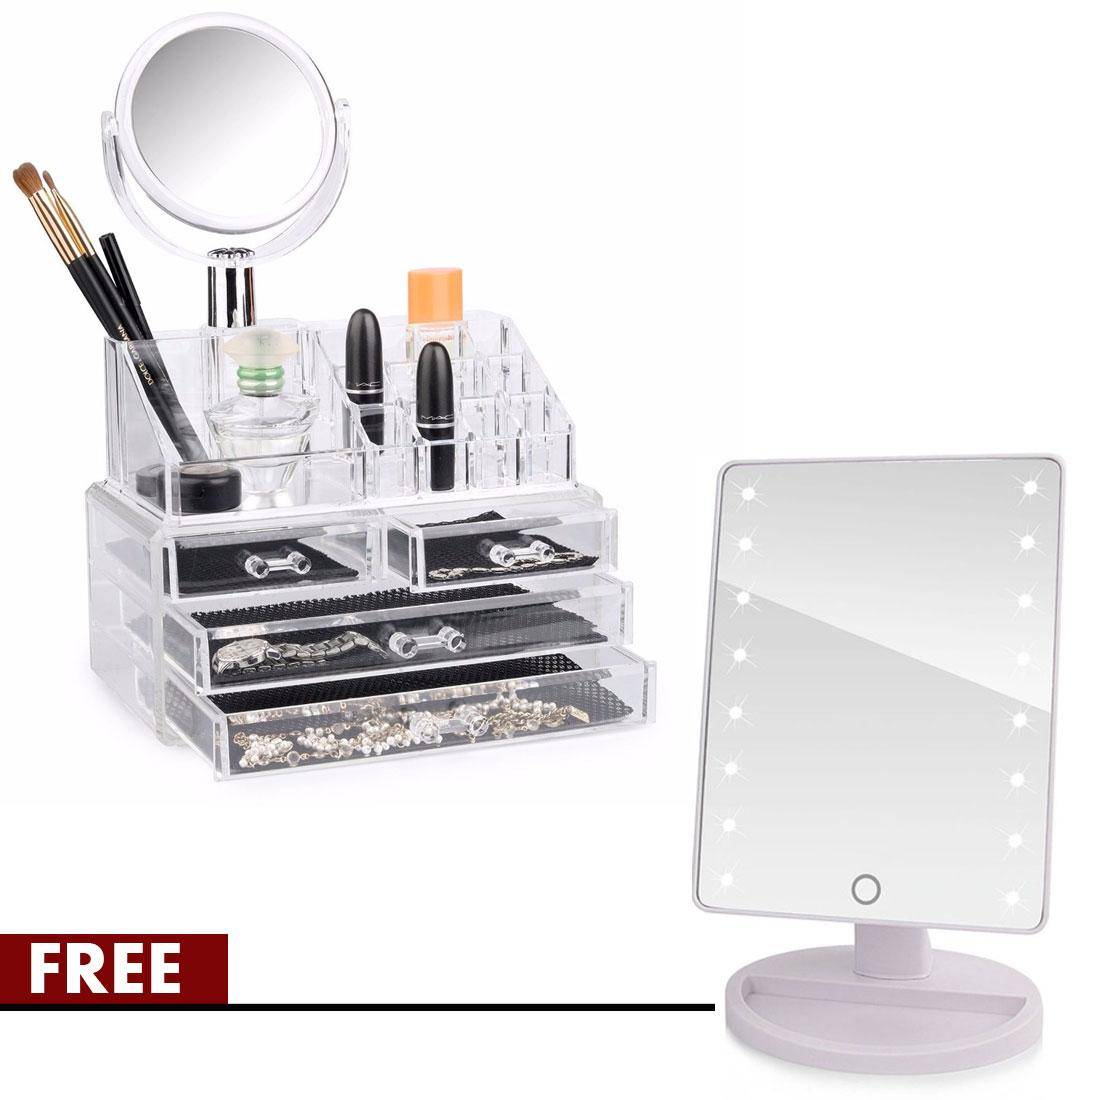 Stylish High Fashion 4 Doors Acrylic Cosmetic Make Up Organiser With Mirror Free Xr